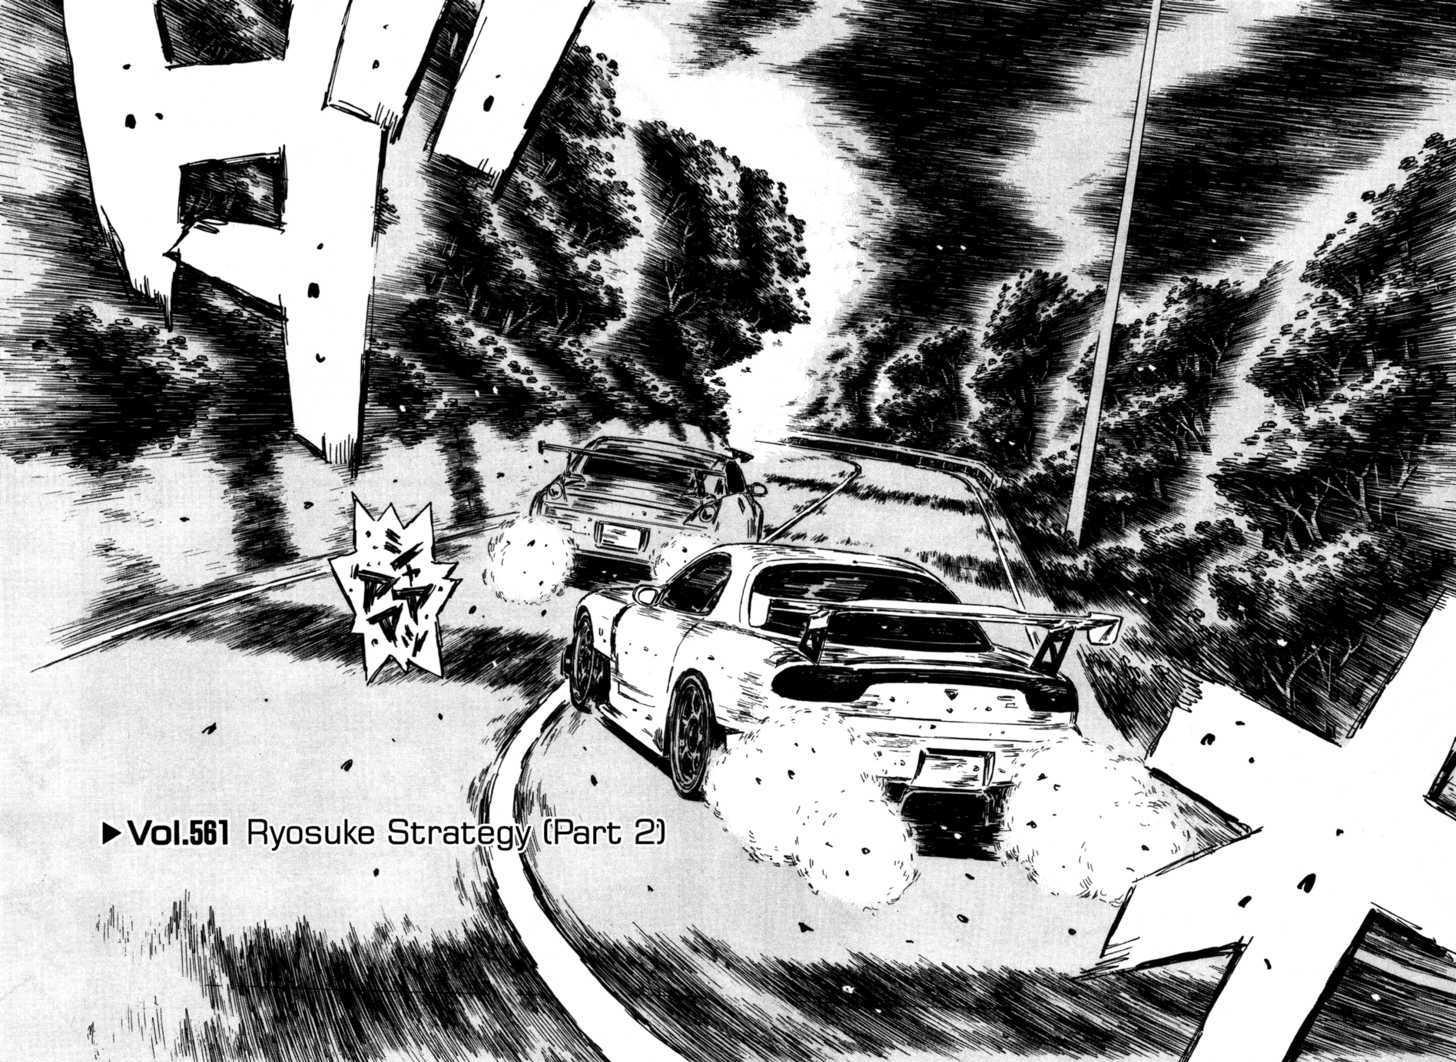 https://im.nineanime.com/comics/pic9/61/2493/61237/InitialD5610719.jpg Page 1